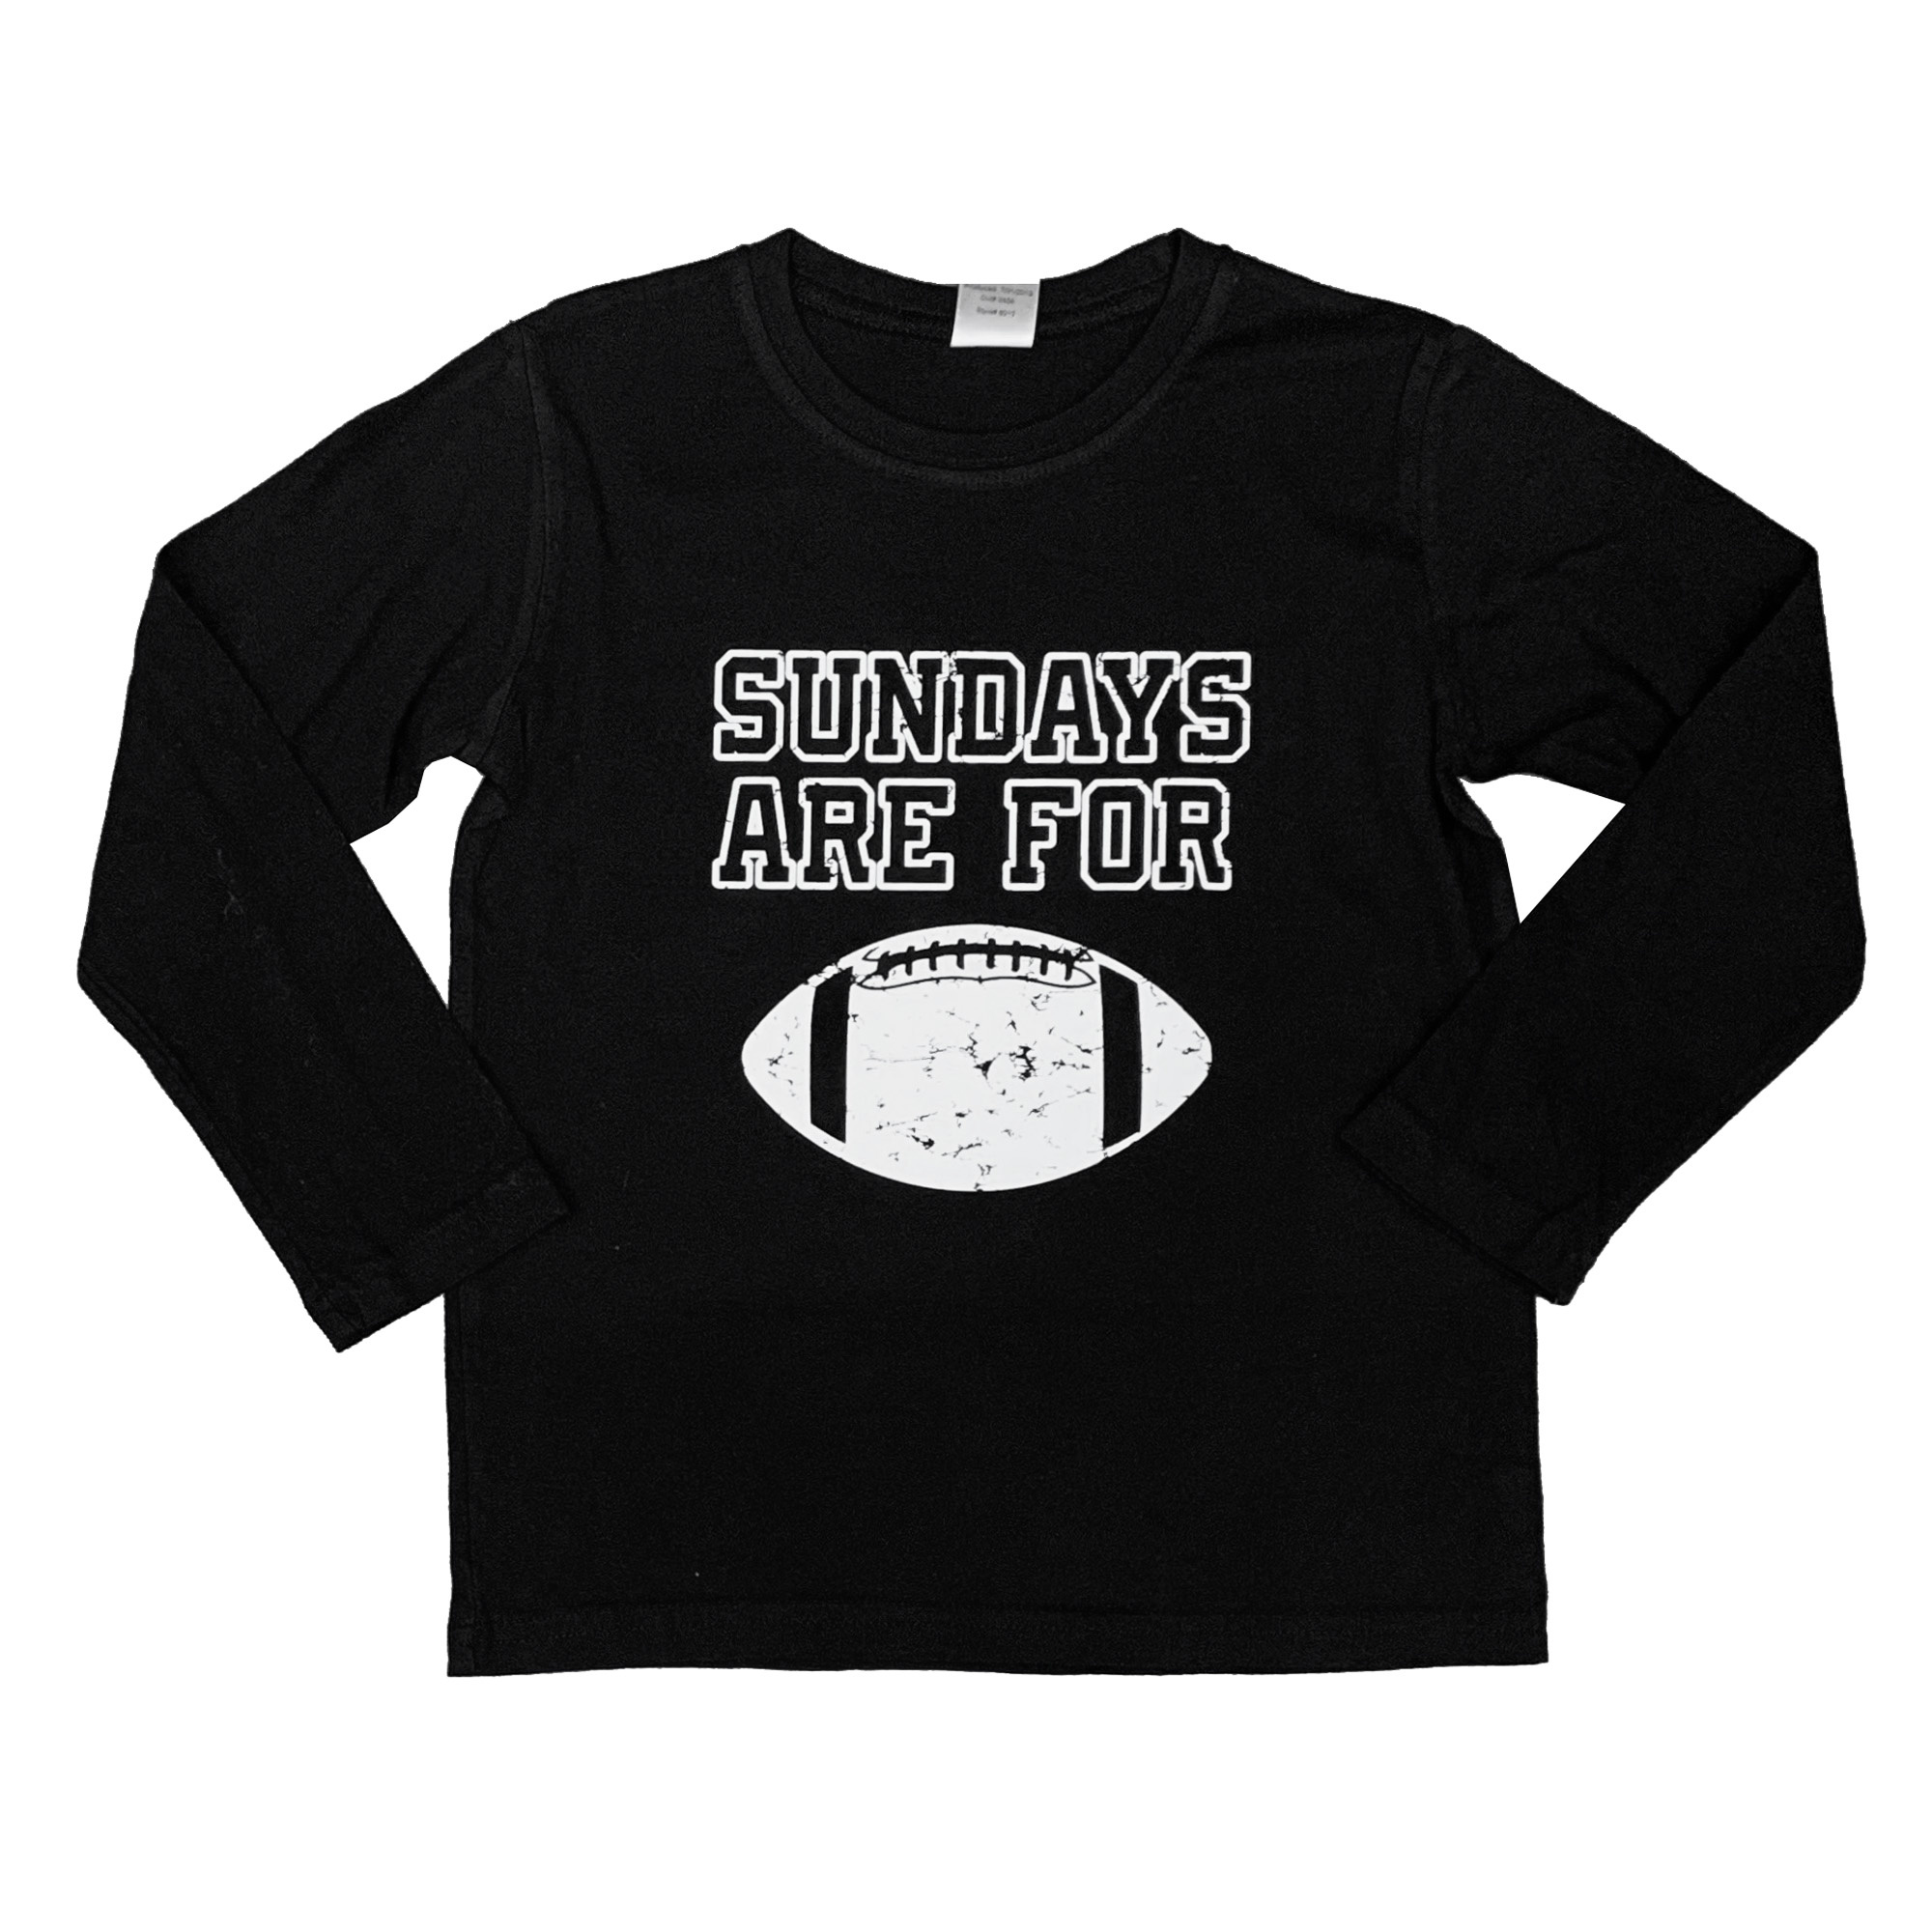 Sundays are for Football Long Sleeve Top